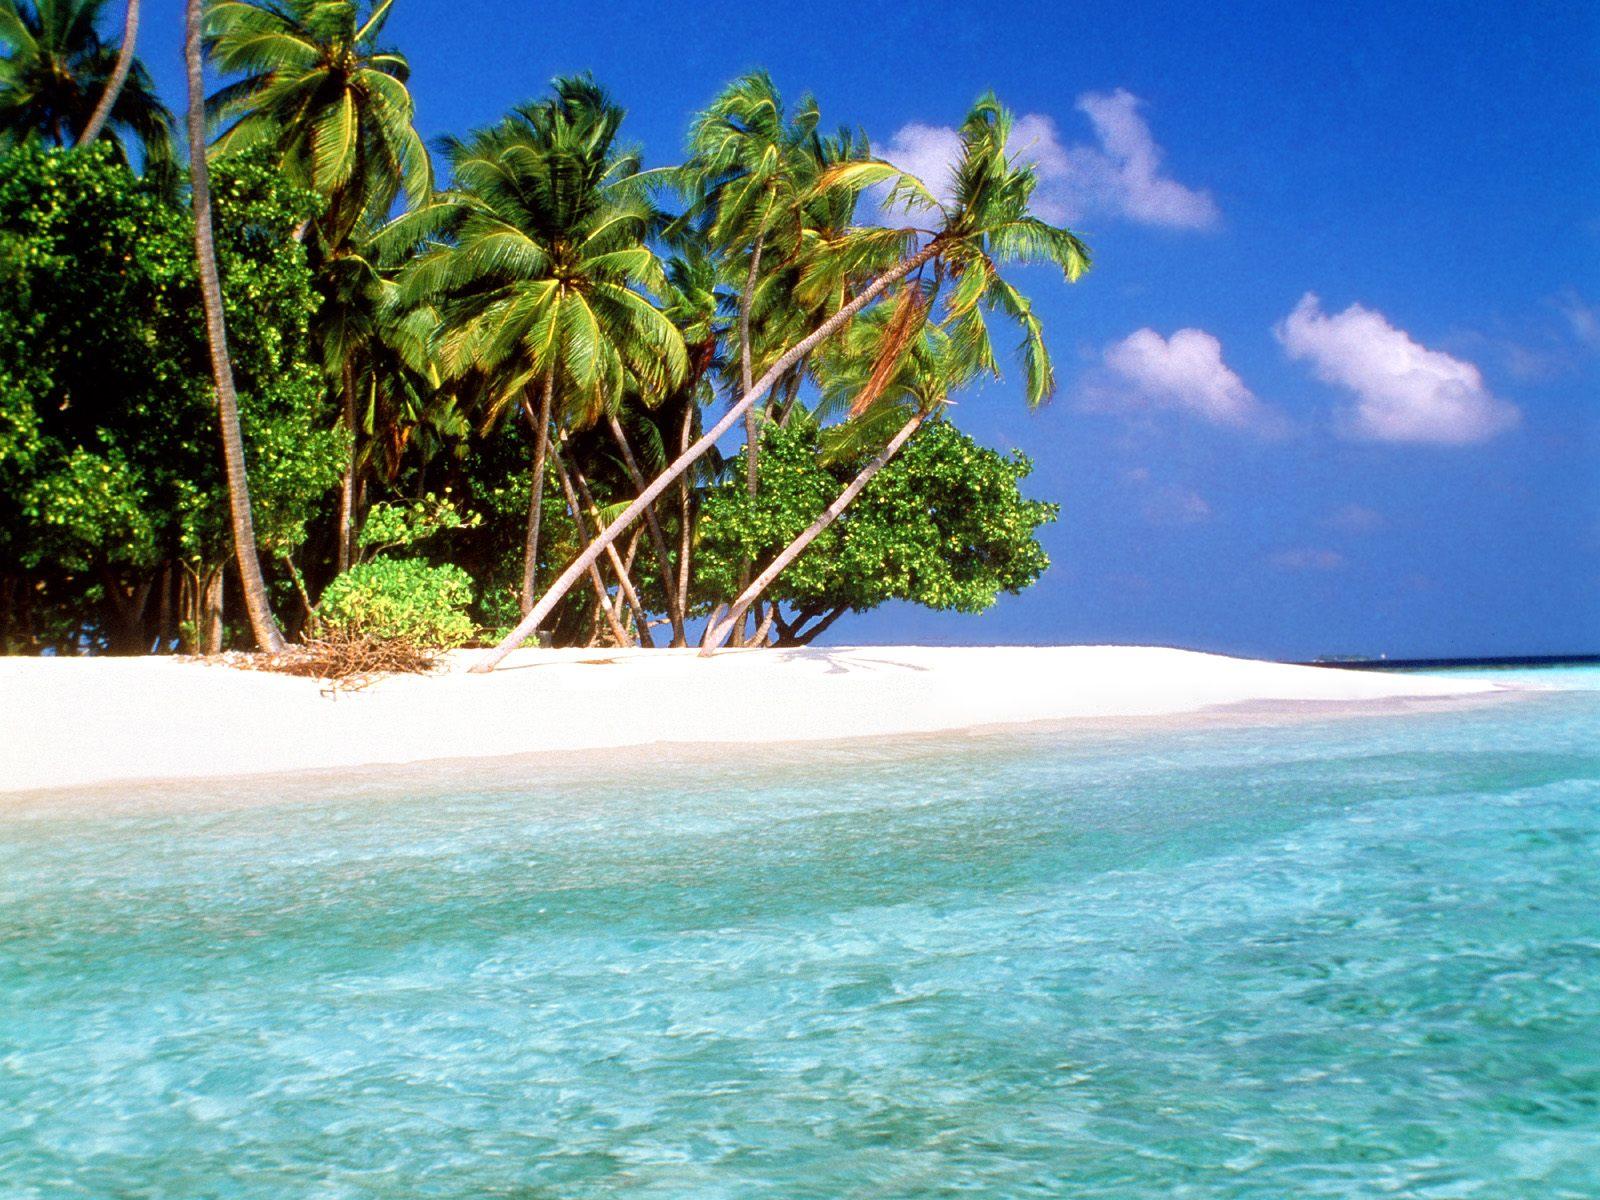 World Visits Tropical Island Beach Wallpaper Review 1600x1200